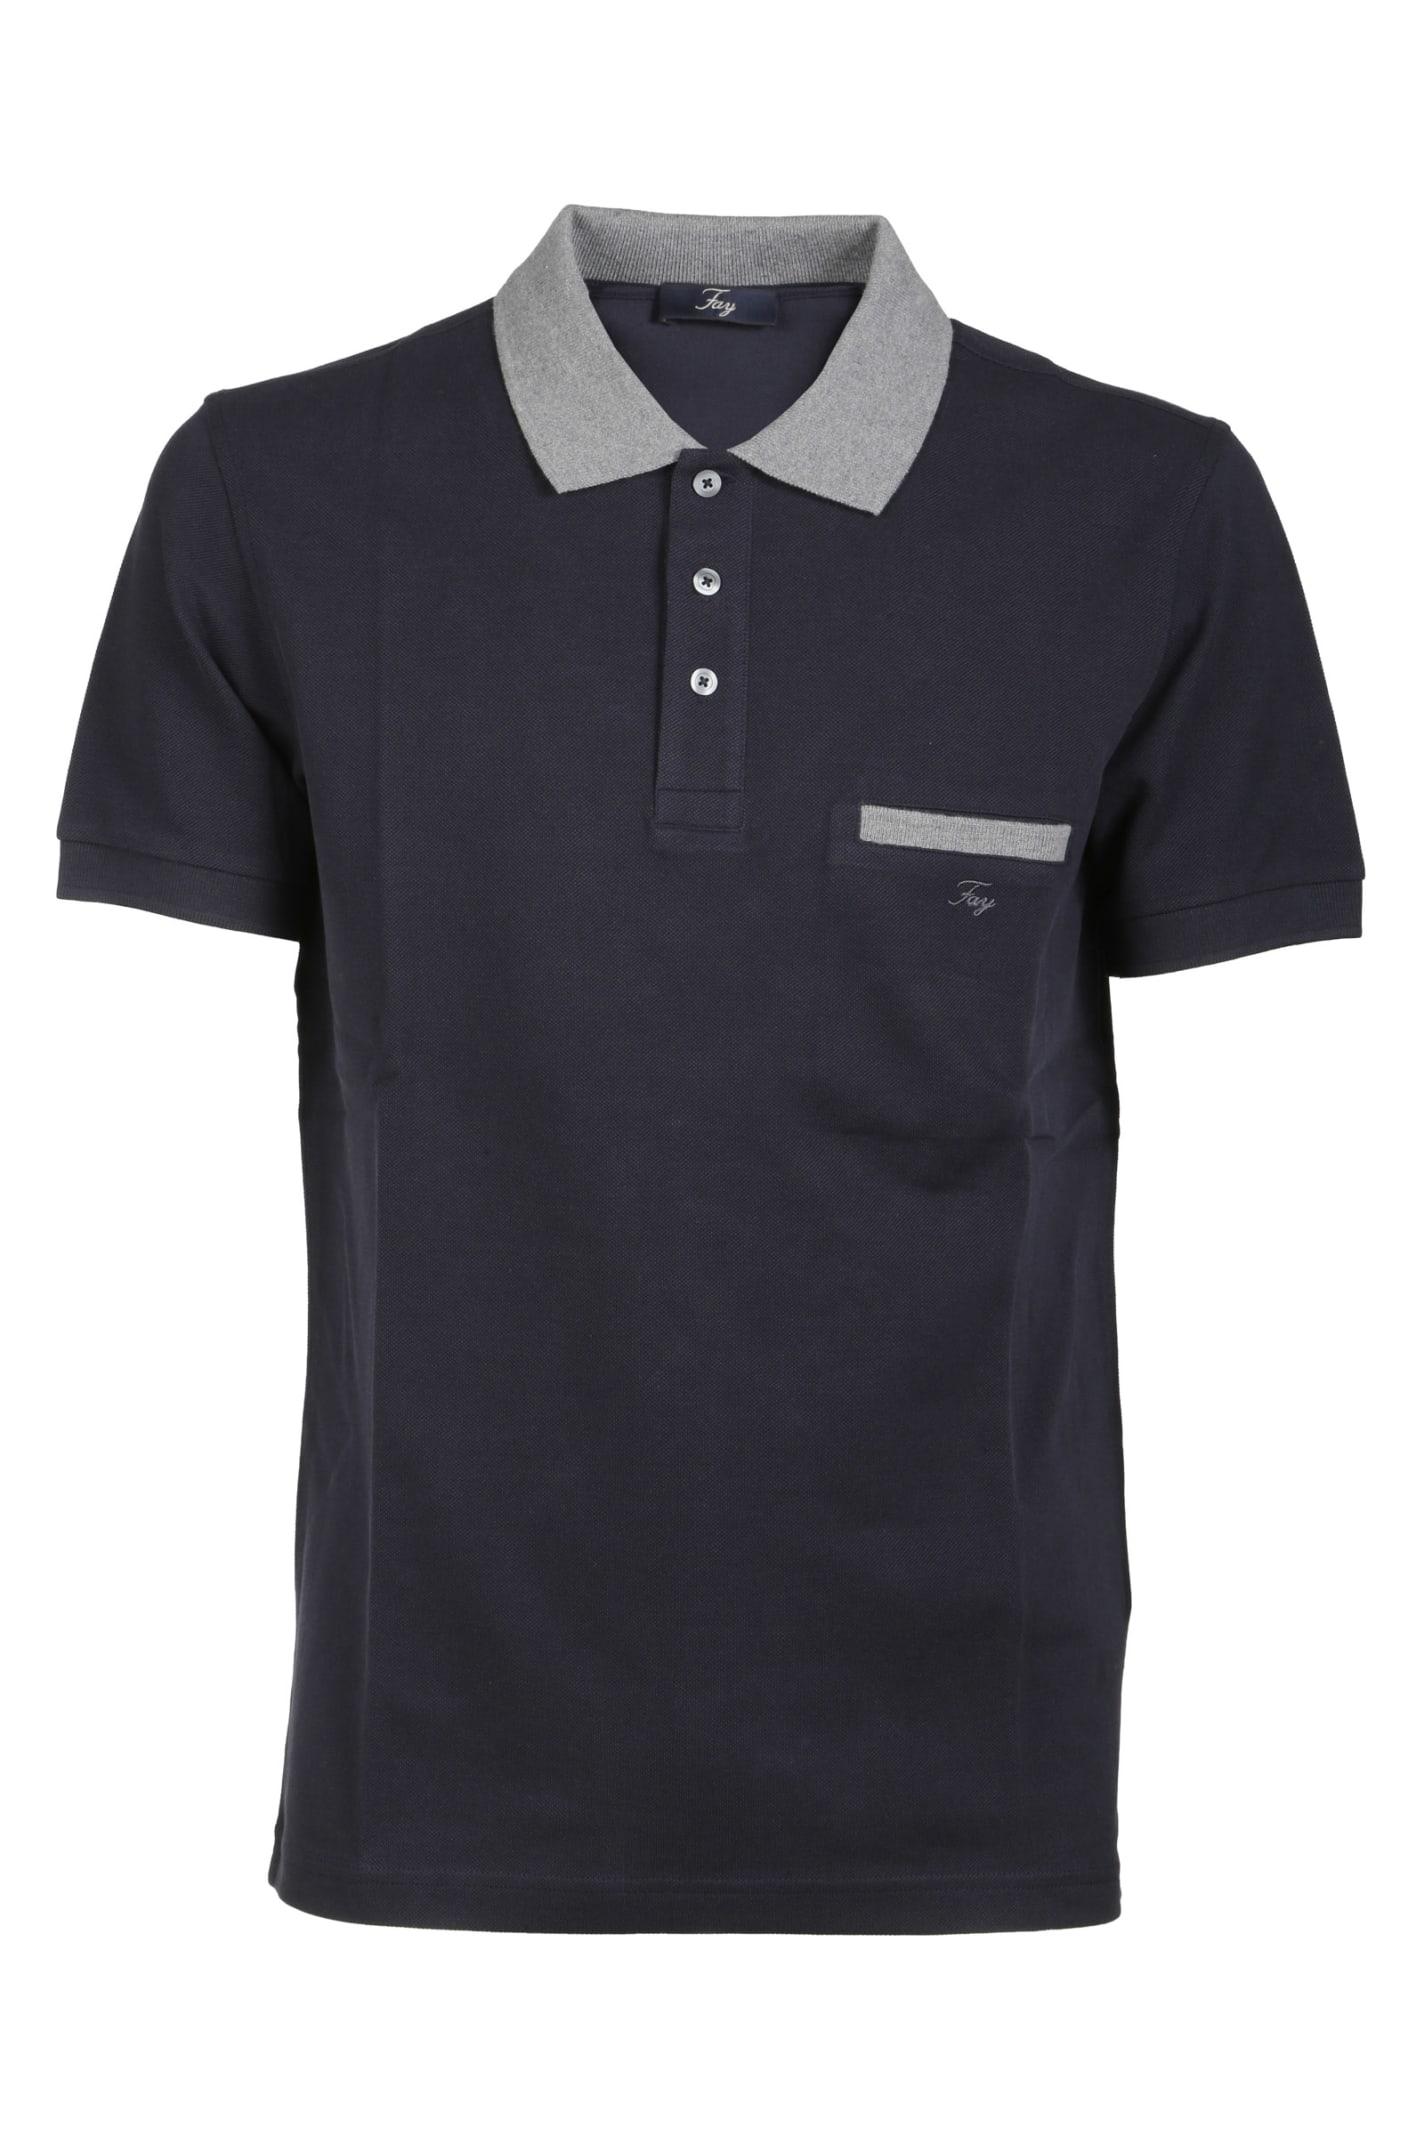 Fay Side Pocket Polo Shirt